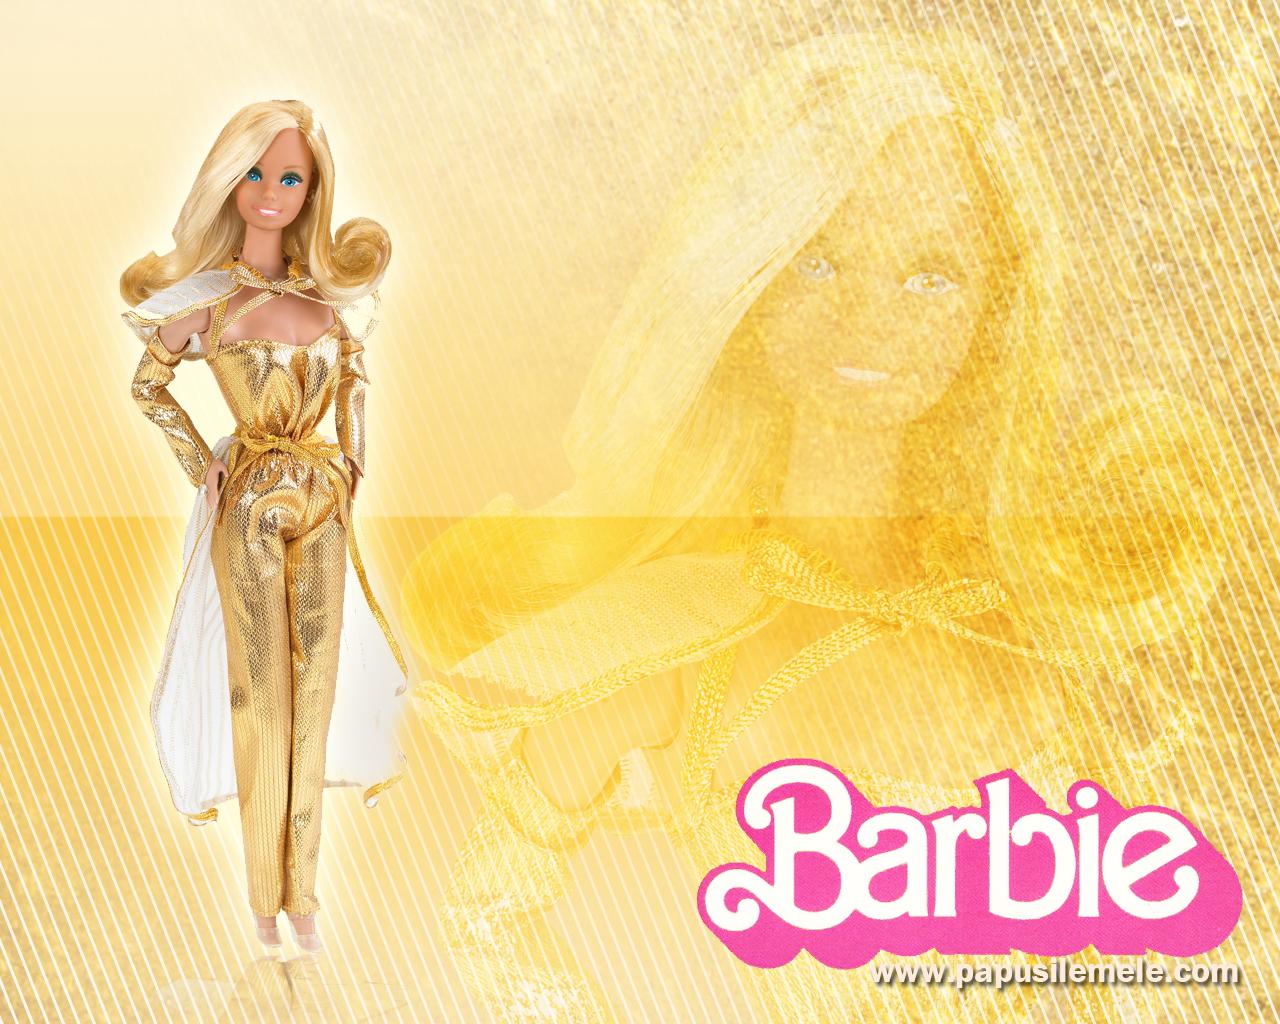 Golden Barbie Princess - Golden Barbie Princess